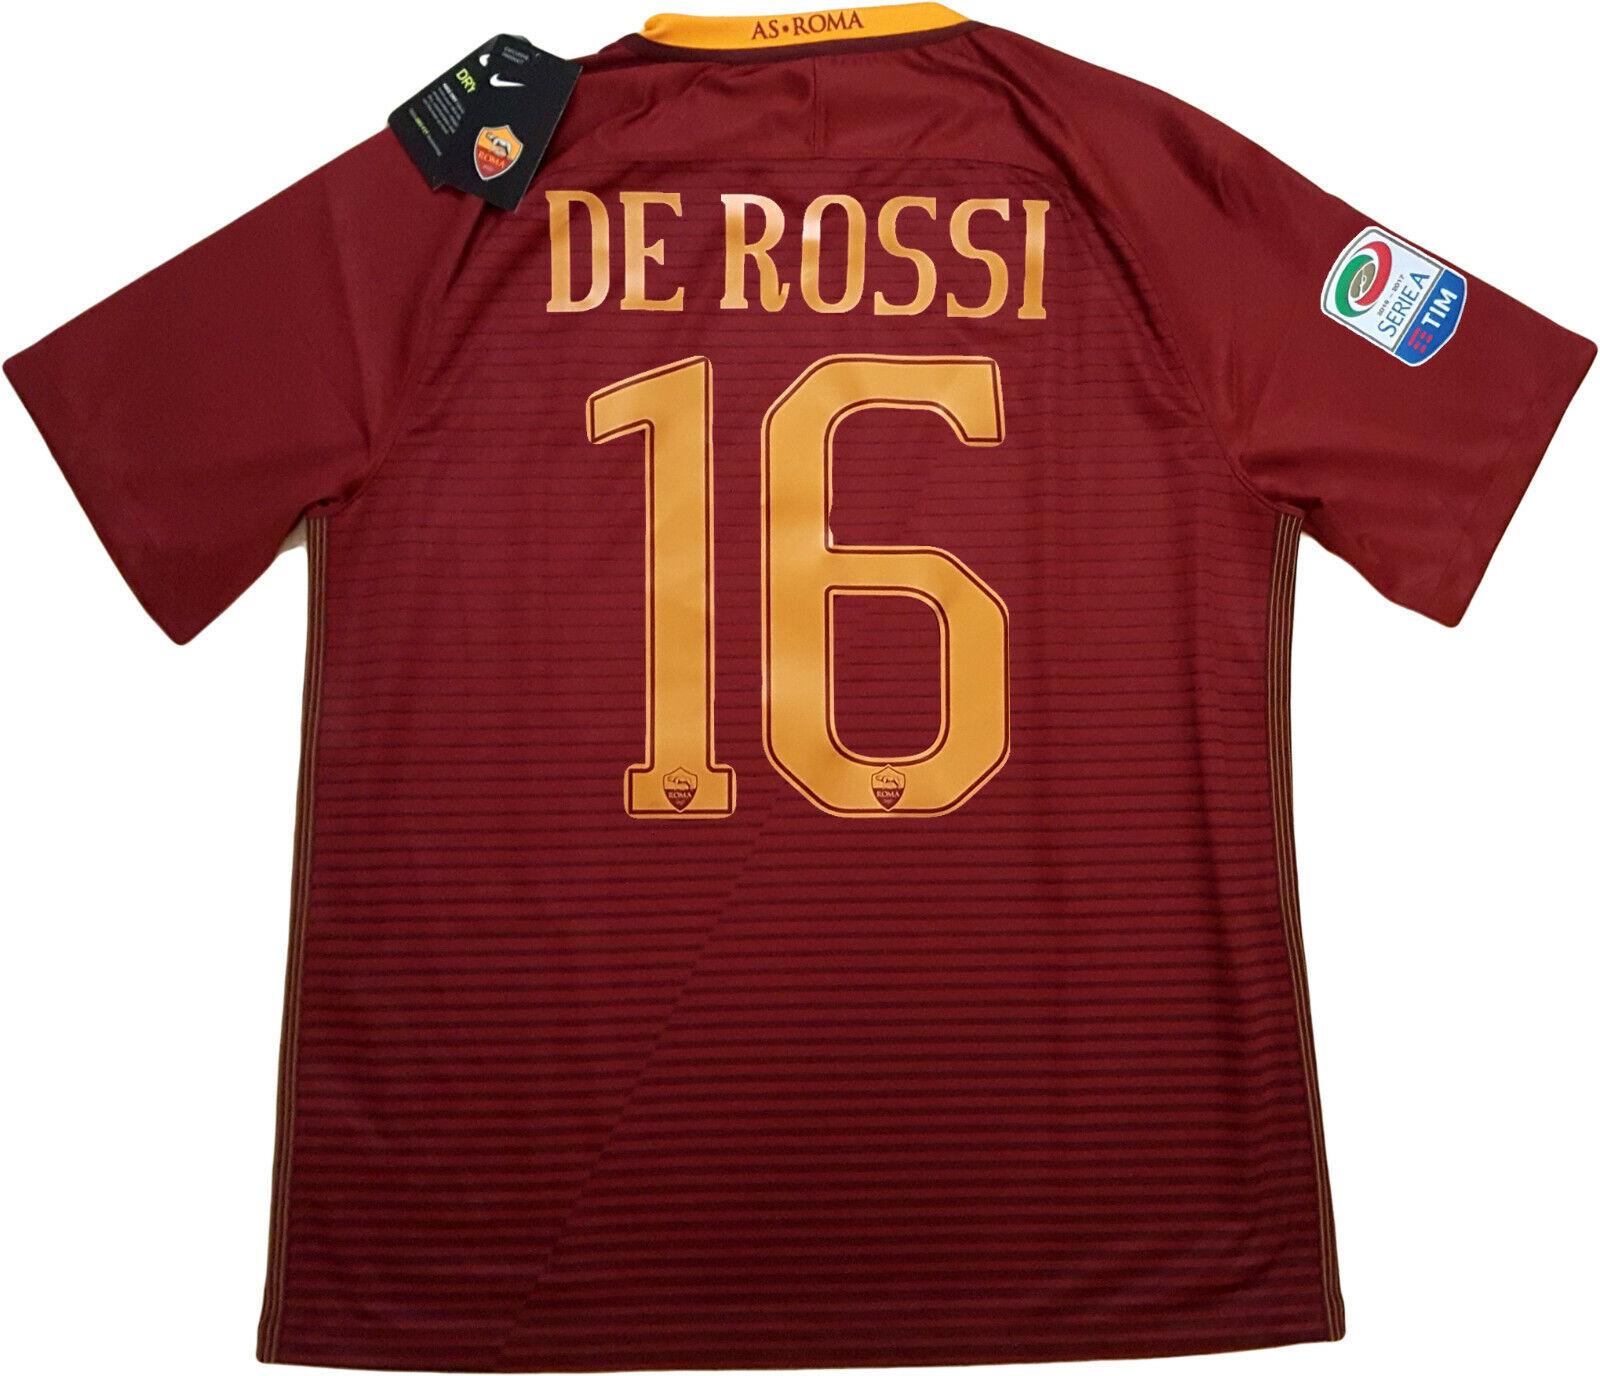 Maglia De Rossi roma shirt jersey SERIE A Ufficiale 2016 17 NIKE STADIUM XL